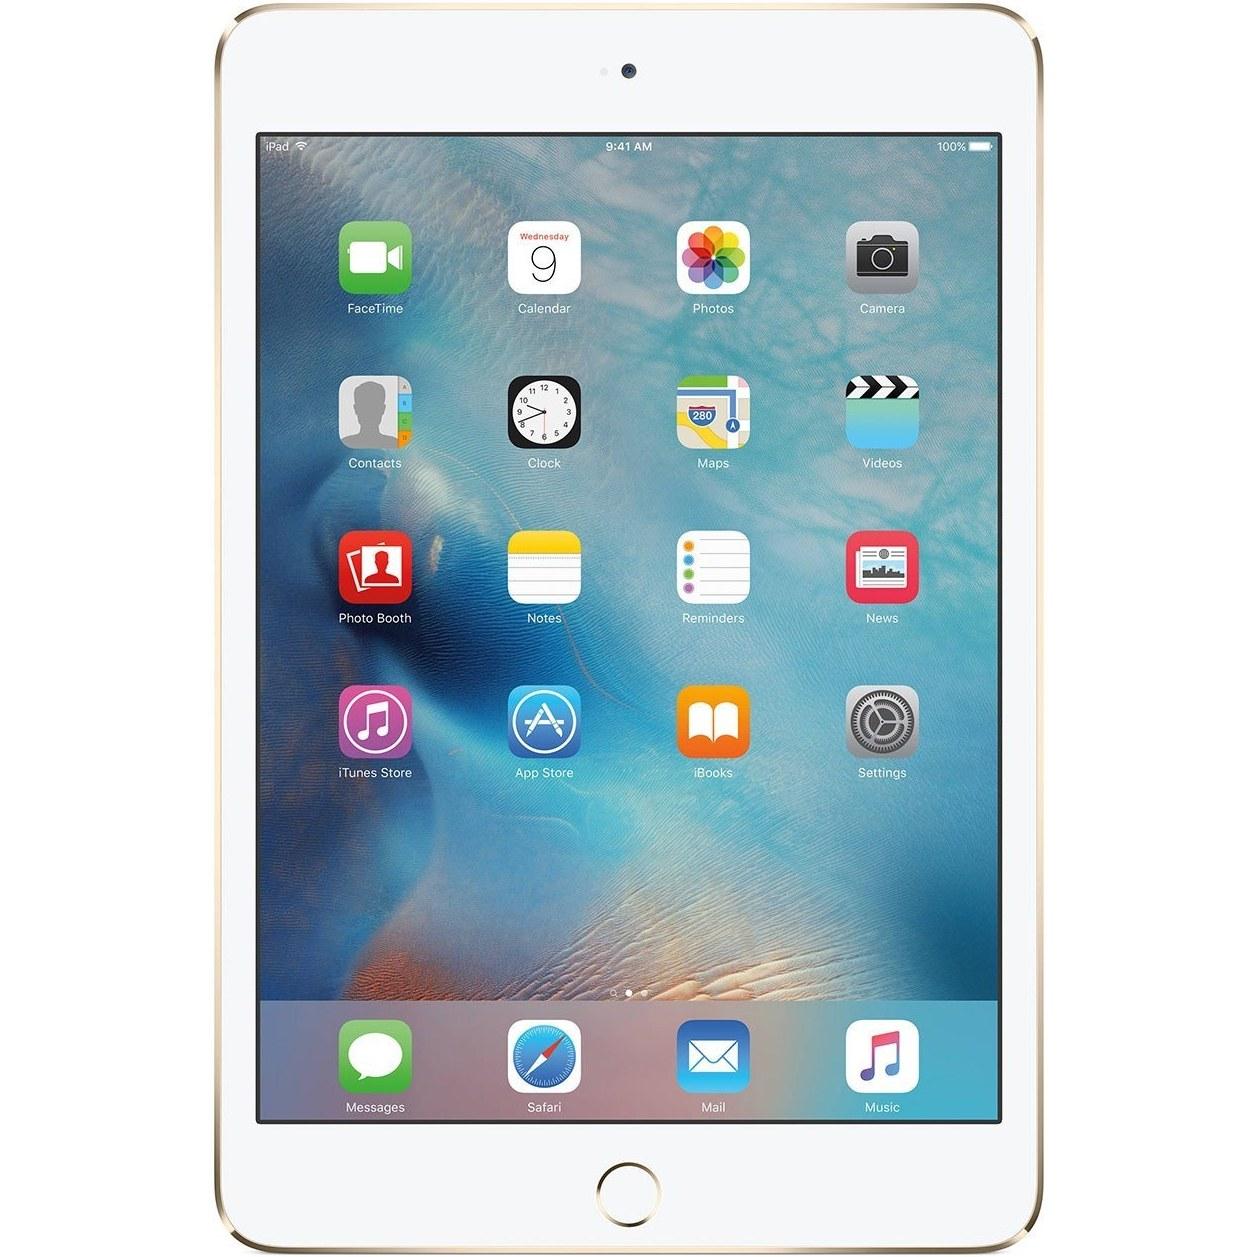 تصویر تبلت iPad mini